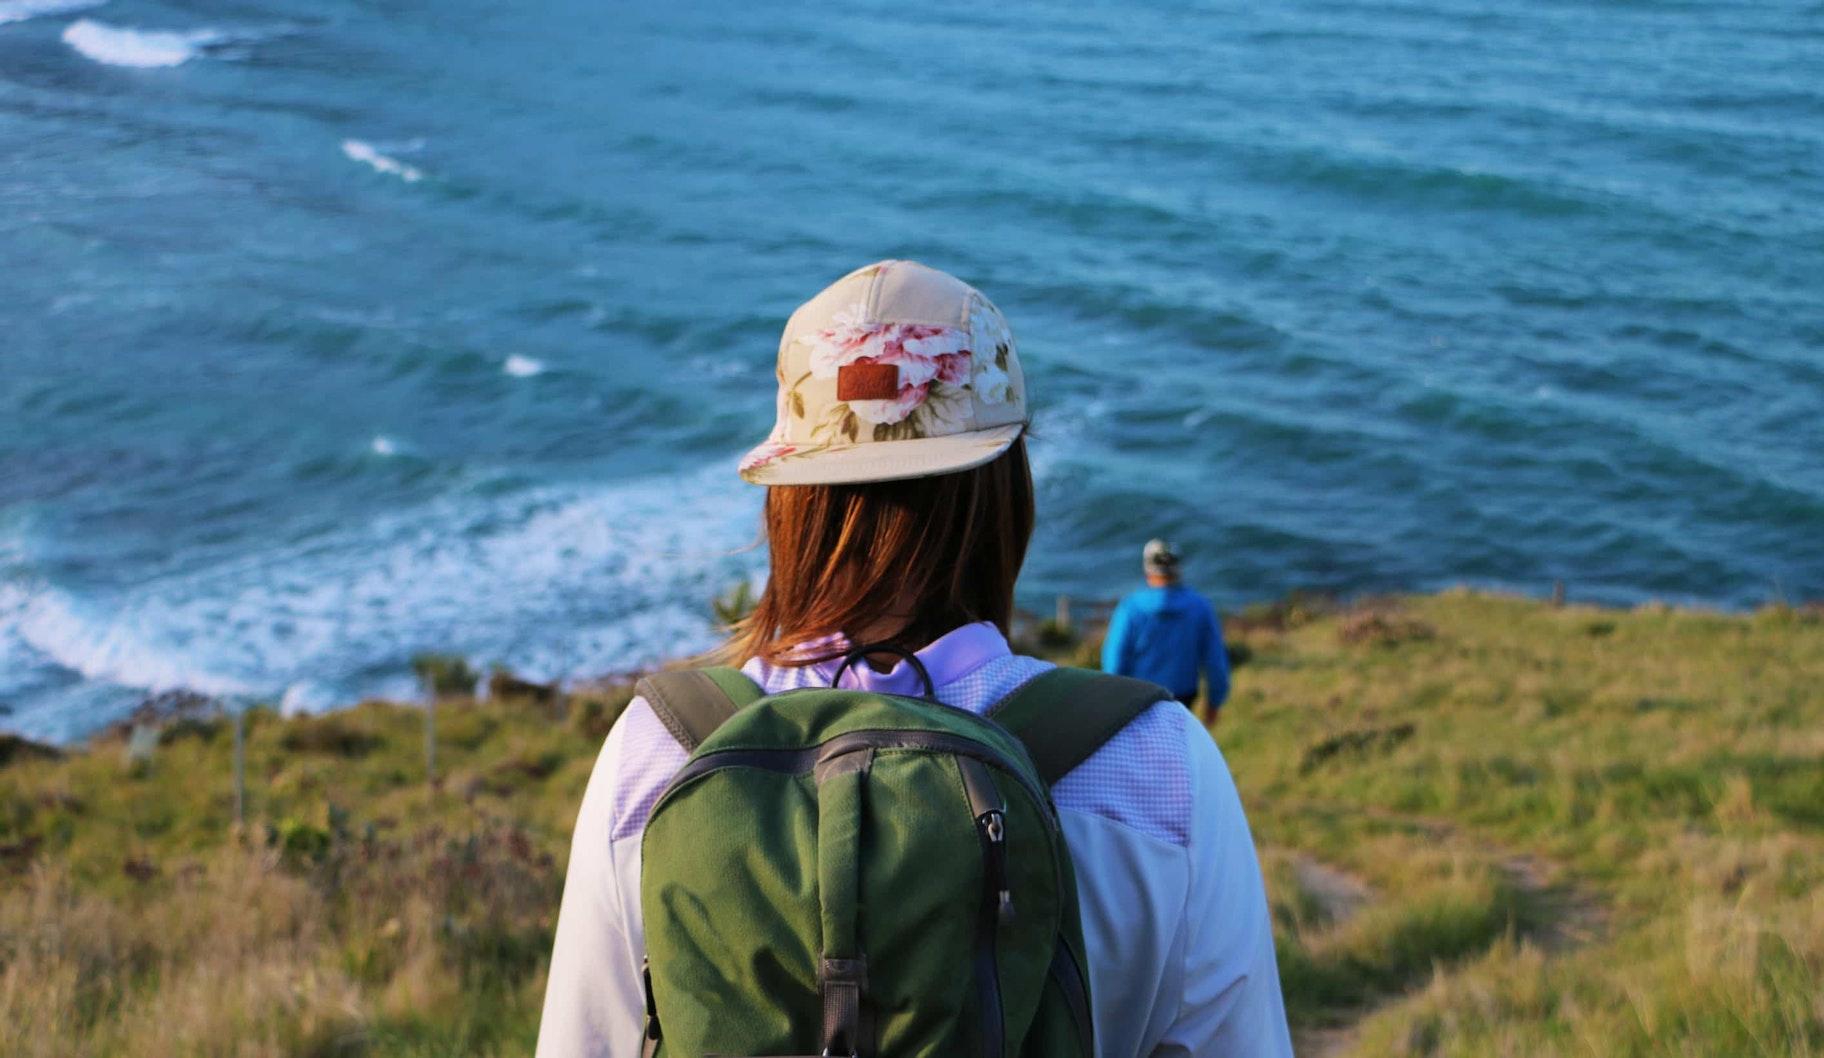 Woman wearing an Offcut hat walks towards the ocean